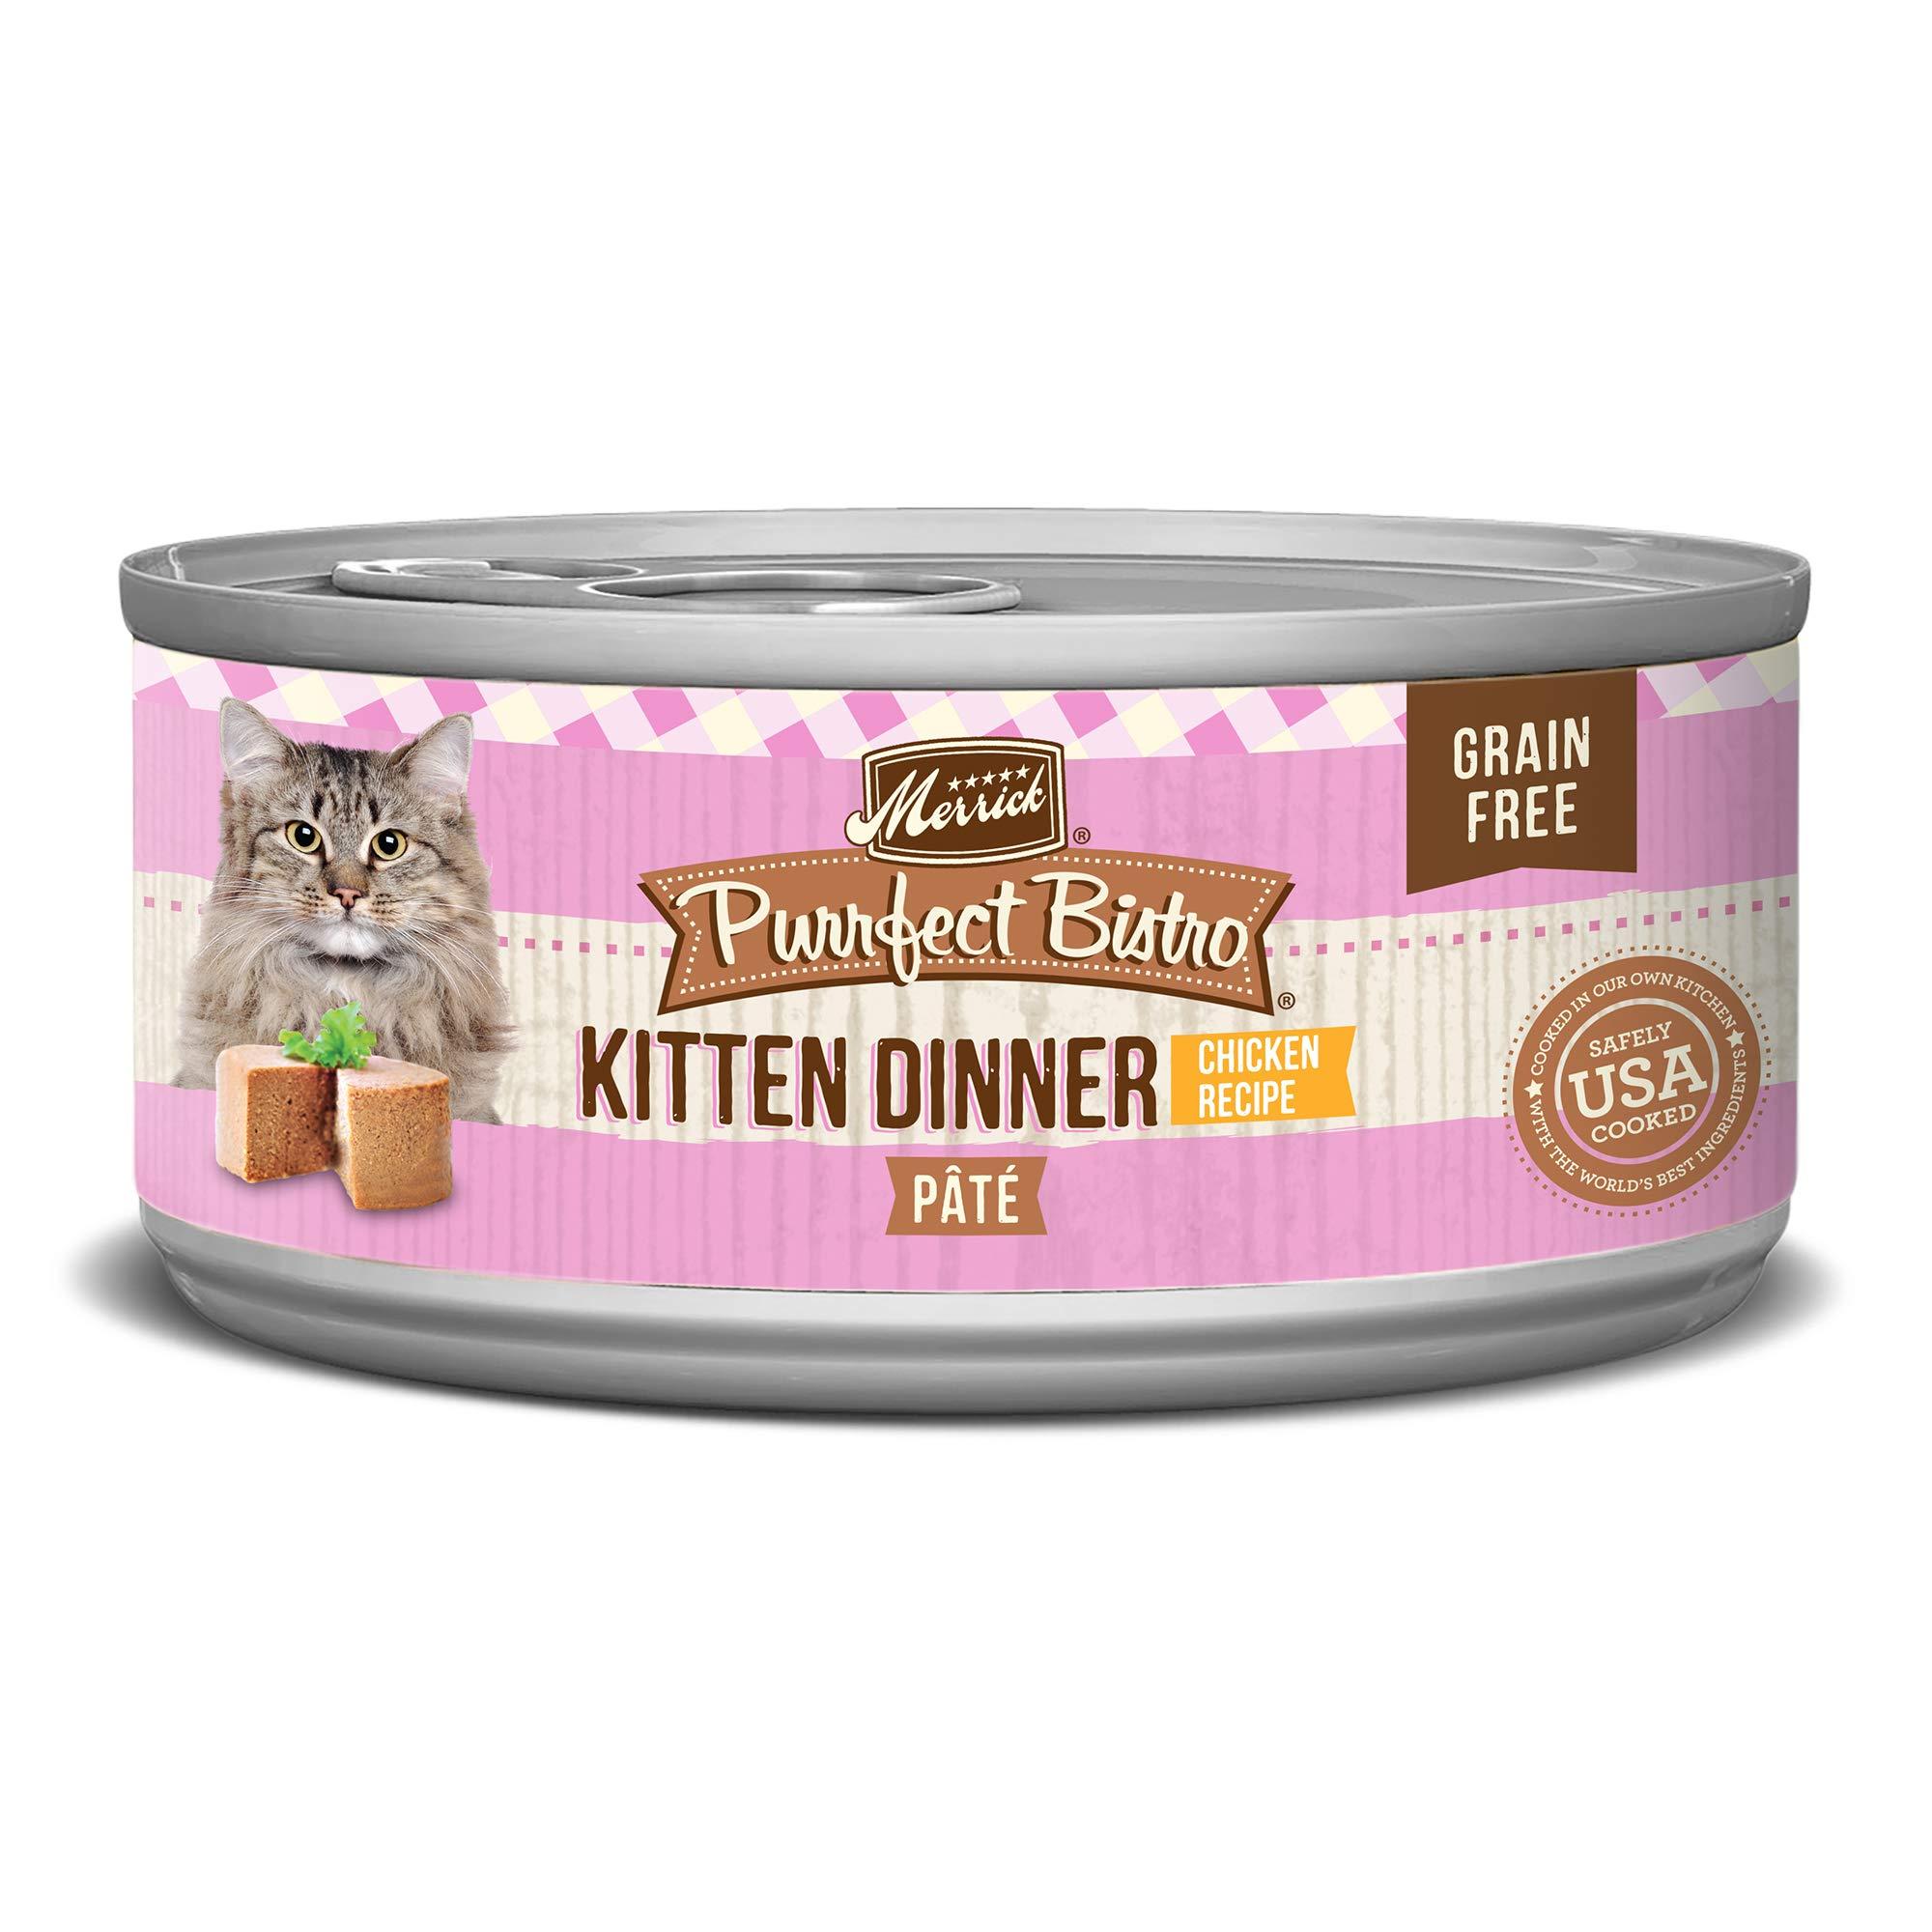 Merrick Purrfect Bistro Grain Free, 5.5 oz, Kitten Recipe - Pack of 24  by Merrick